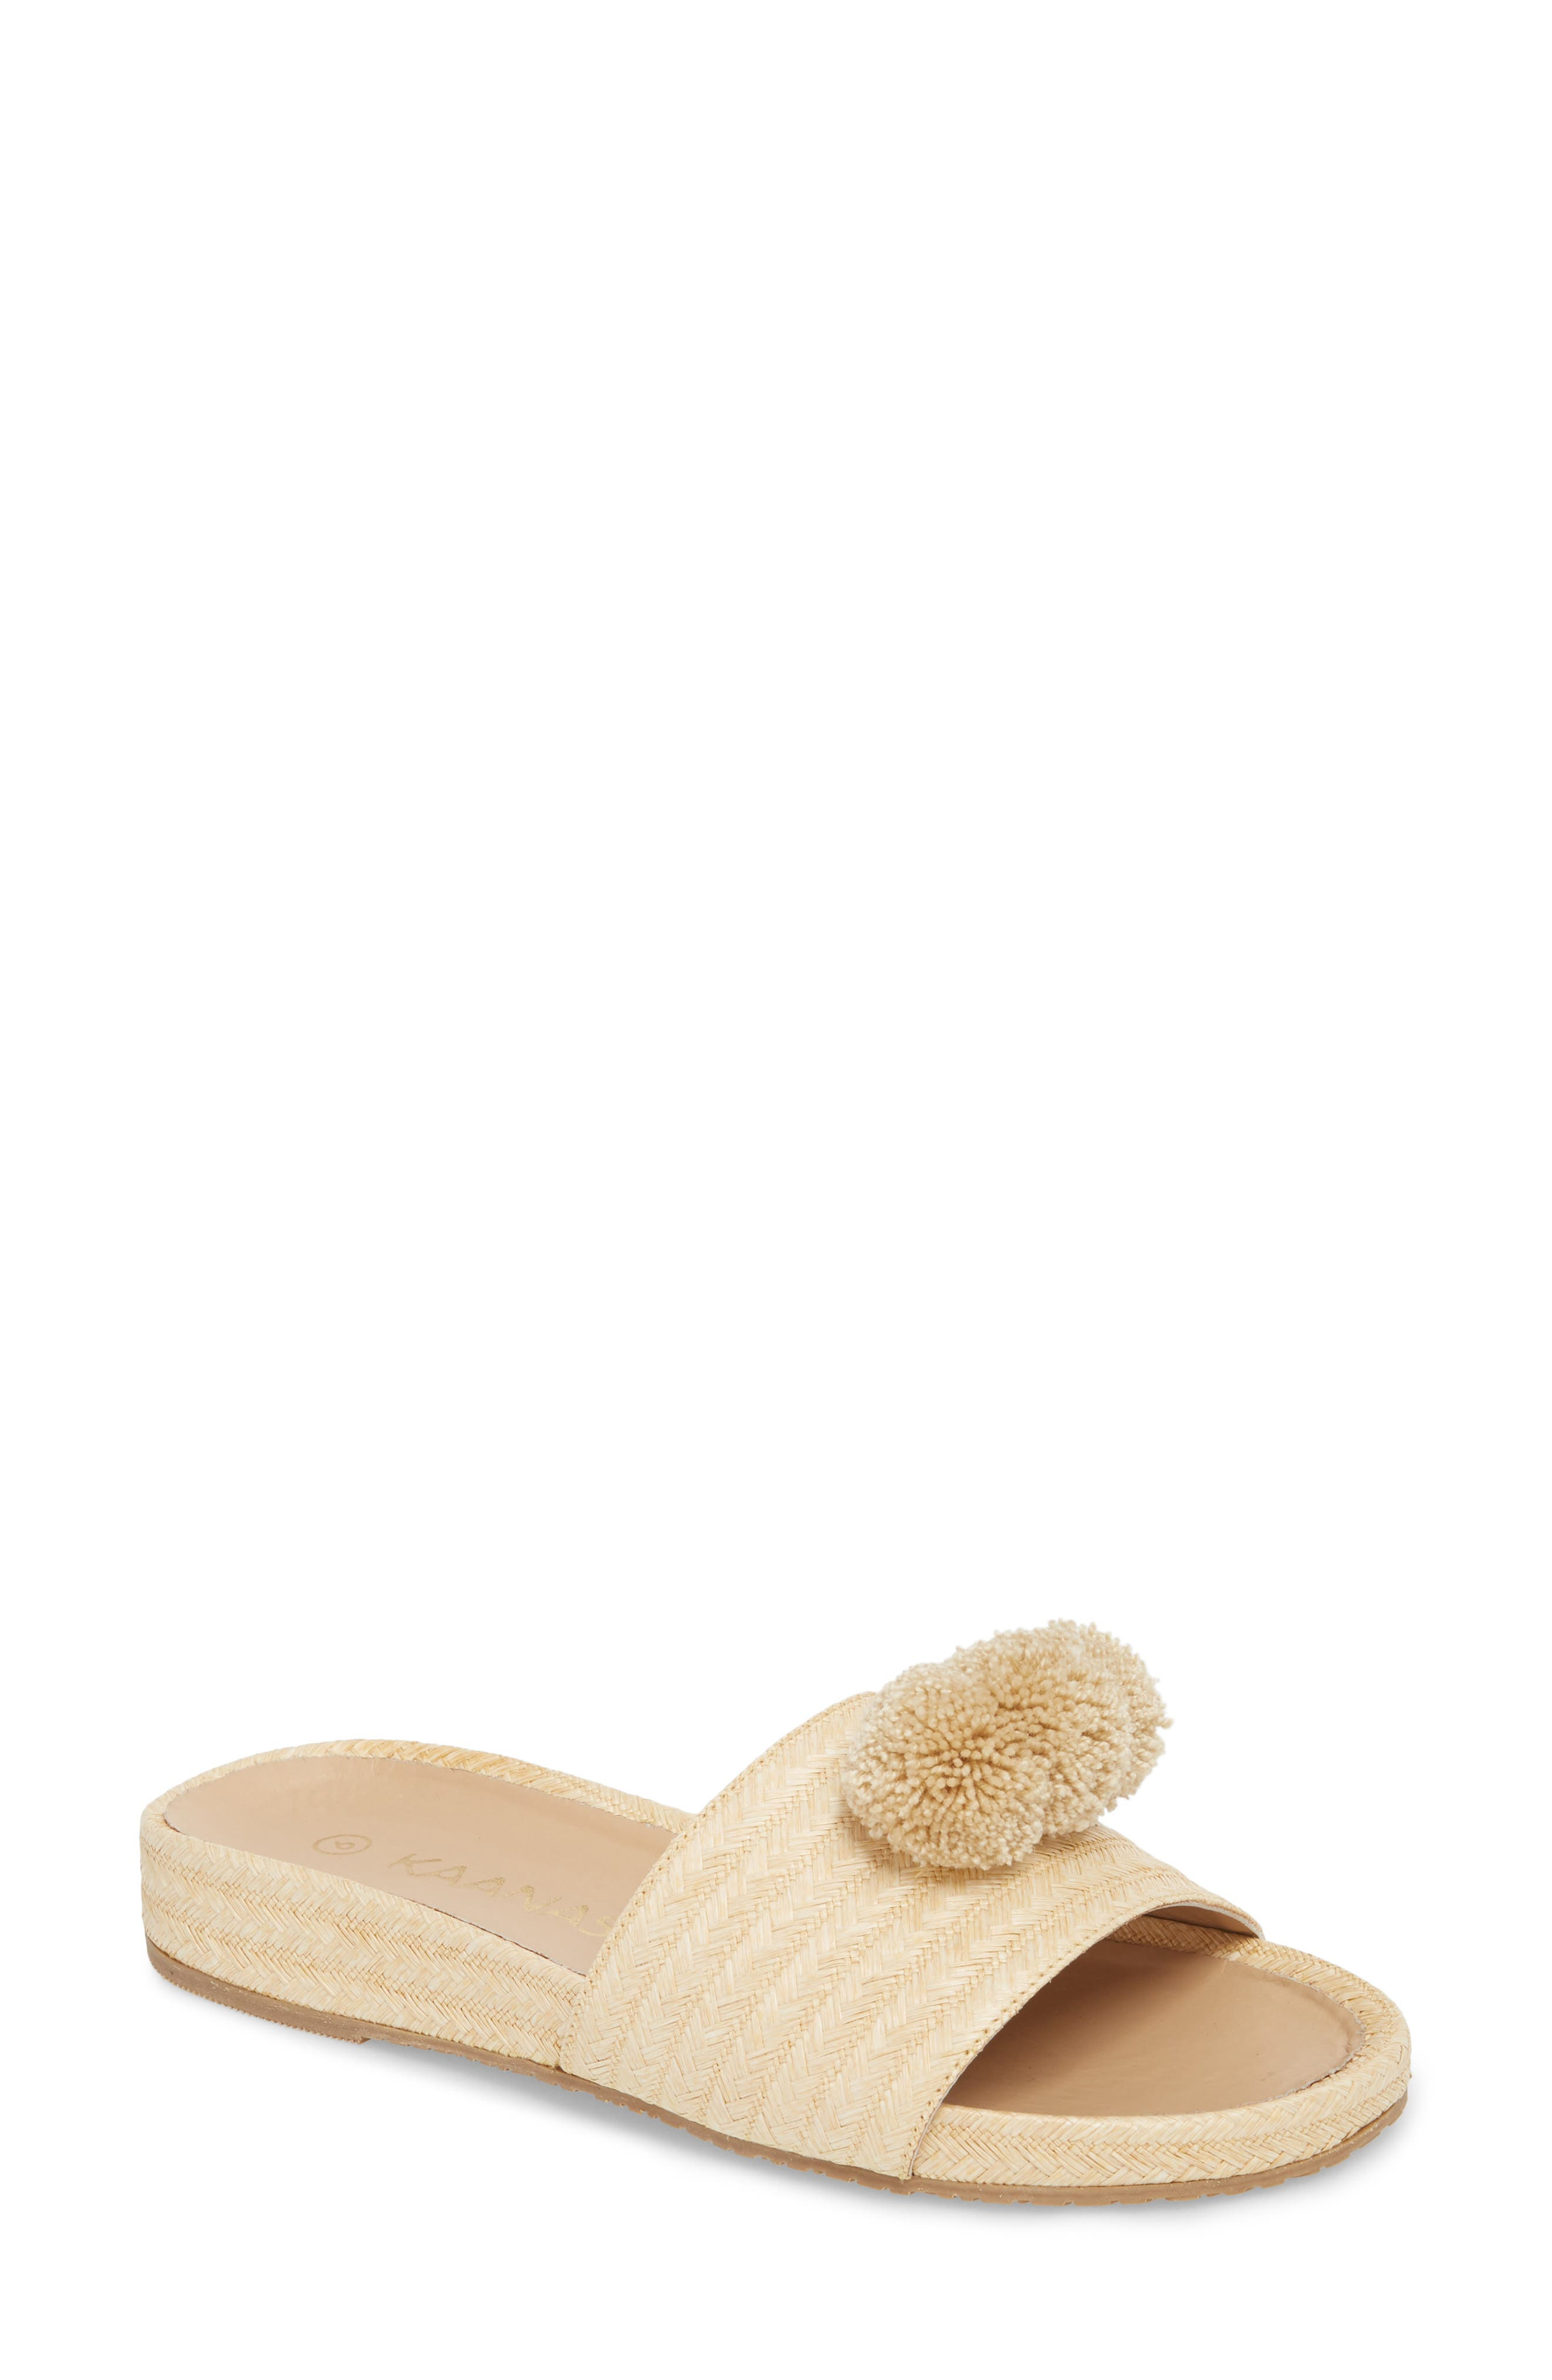 Santa Cruz Pom Slide Sandal,                             Main thumbnail 1, color,